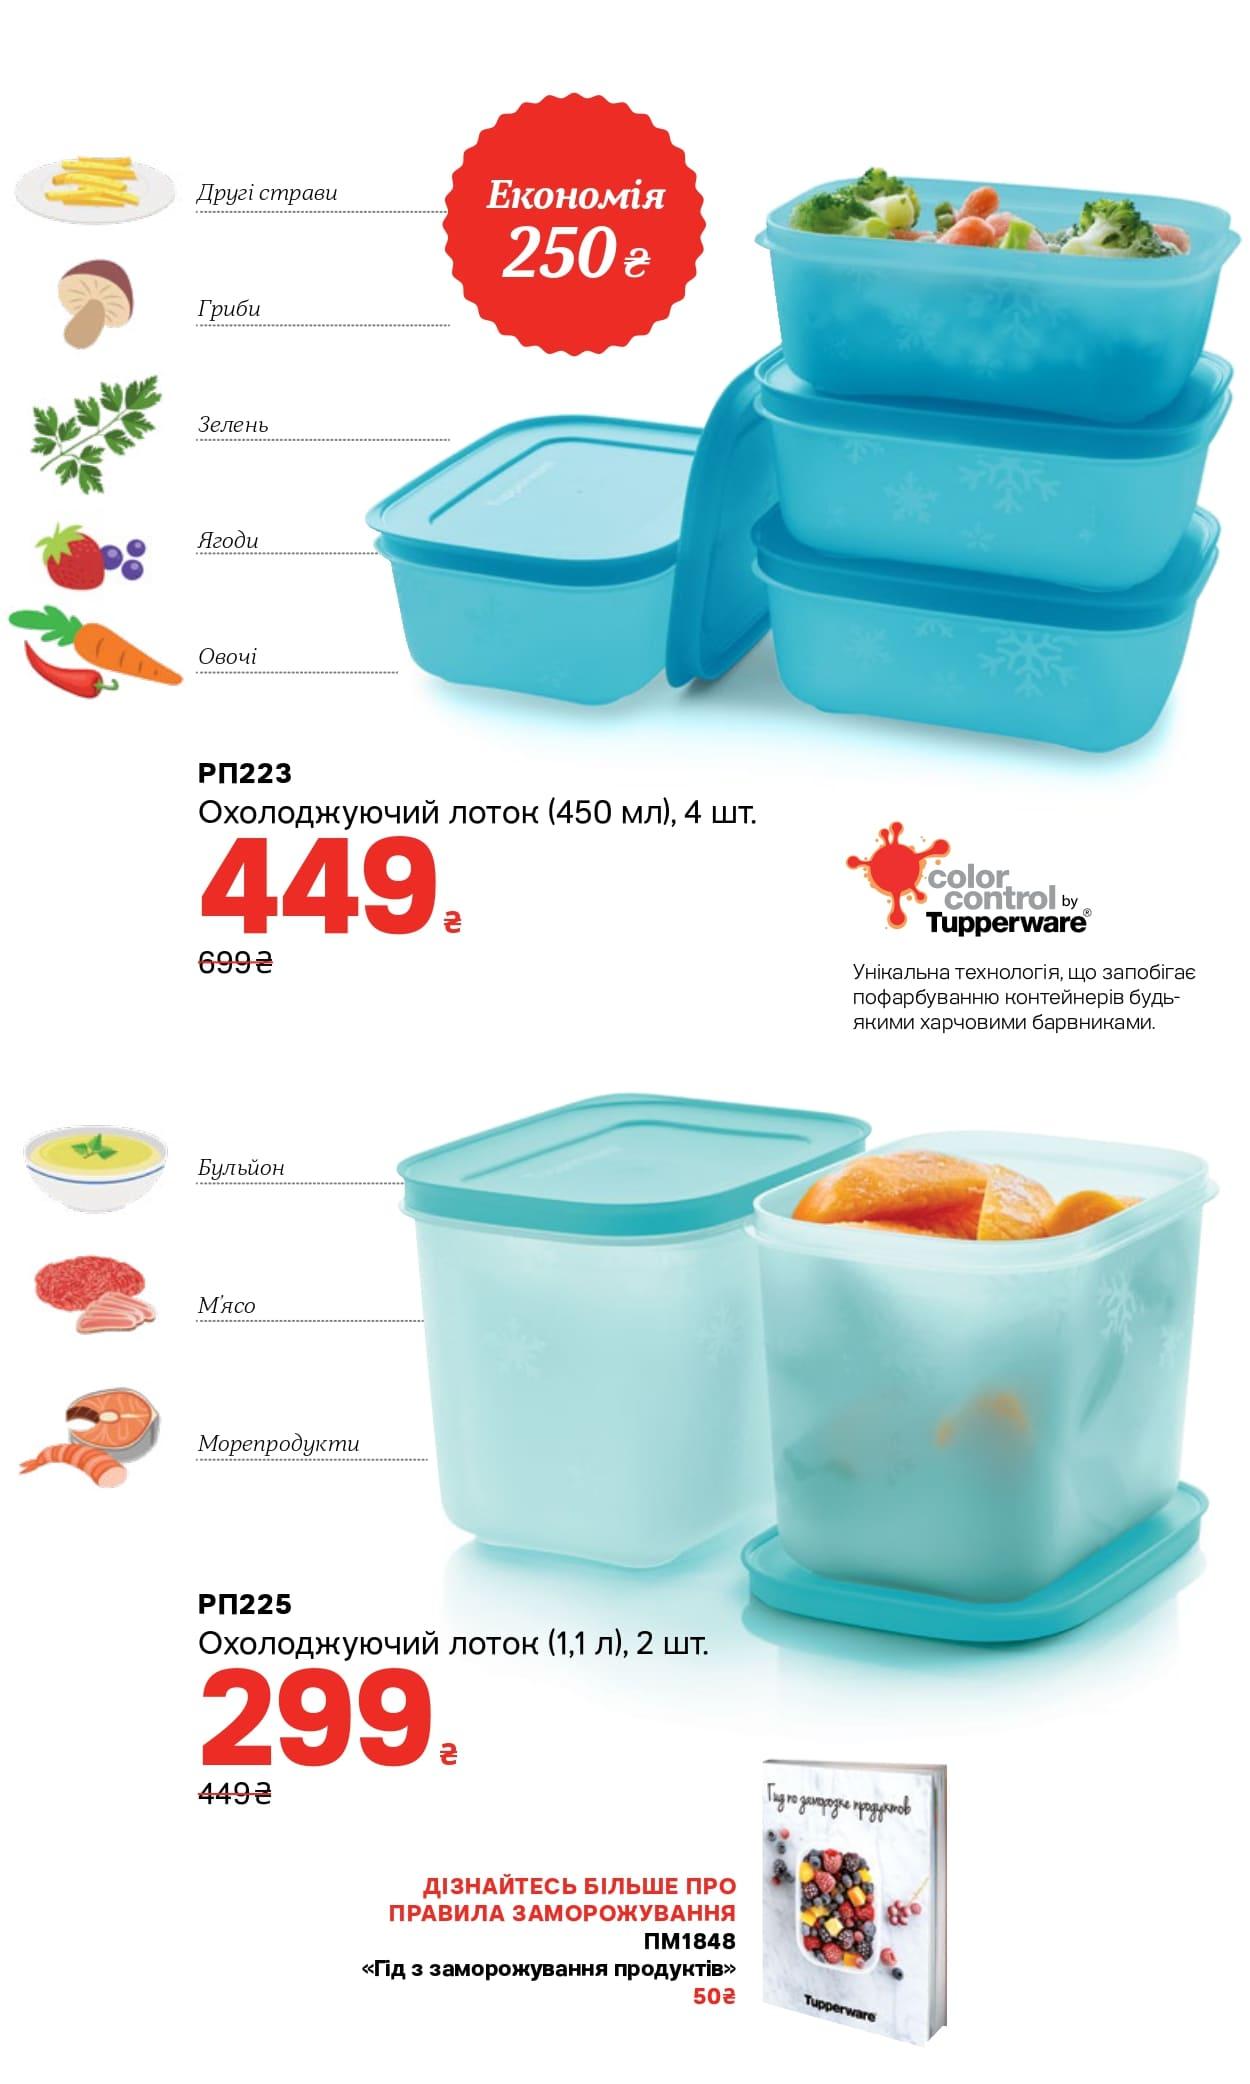 Судочки для заморозки объемом 450 мл и 1,1 литра